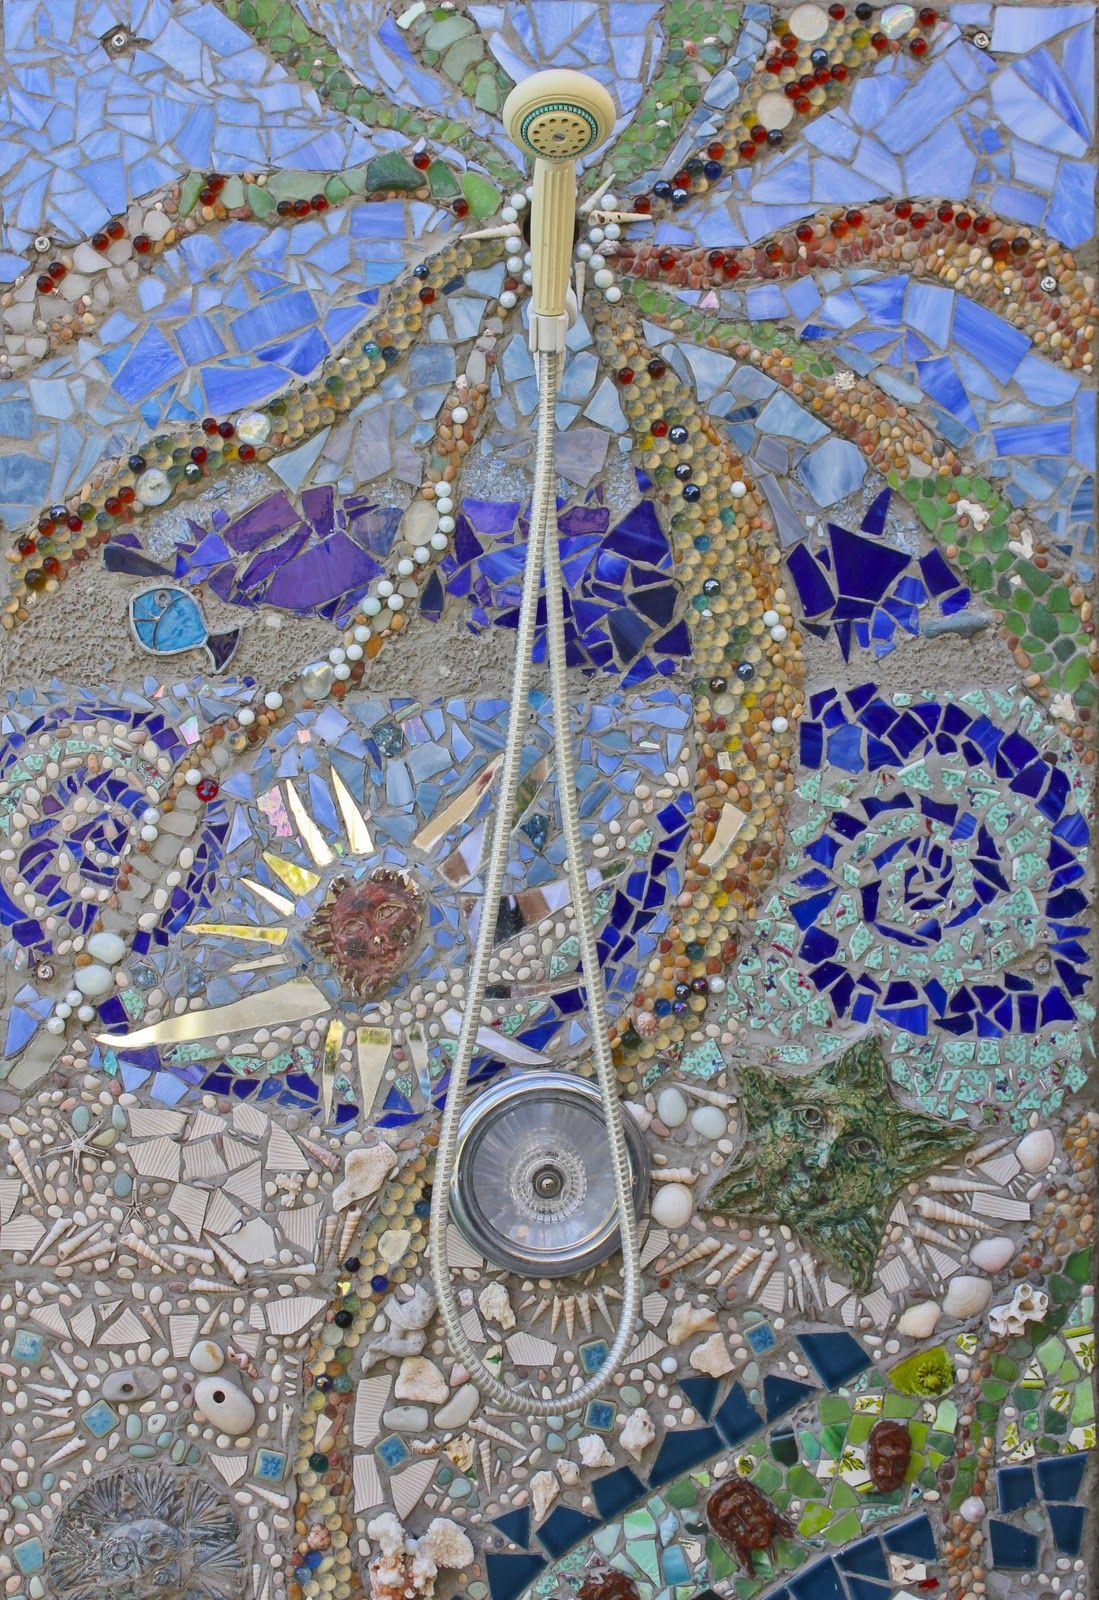 My DIY Outdoor Mosaic Shower Laguna Dirt Mosaic wall